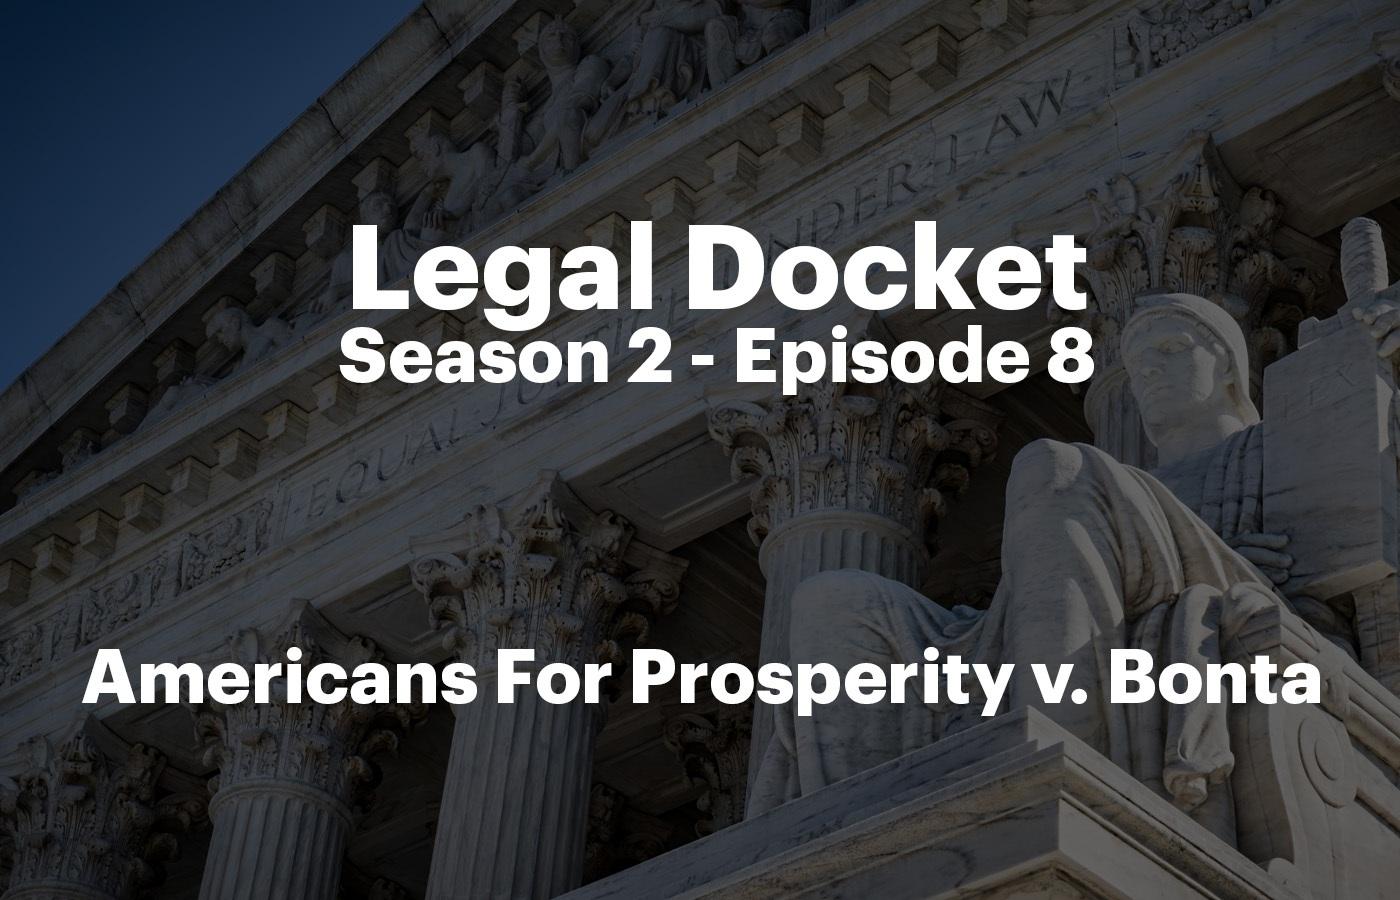 Legal Docket S2 E8 copy